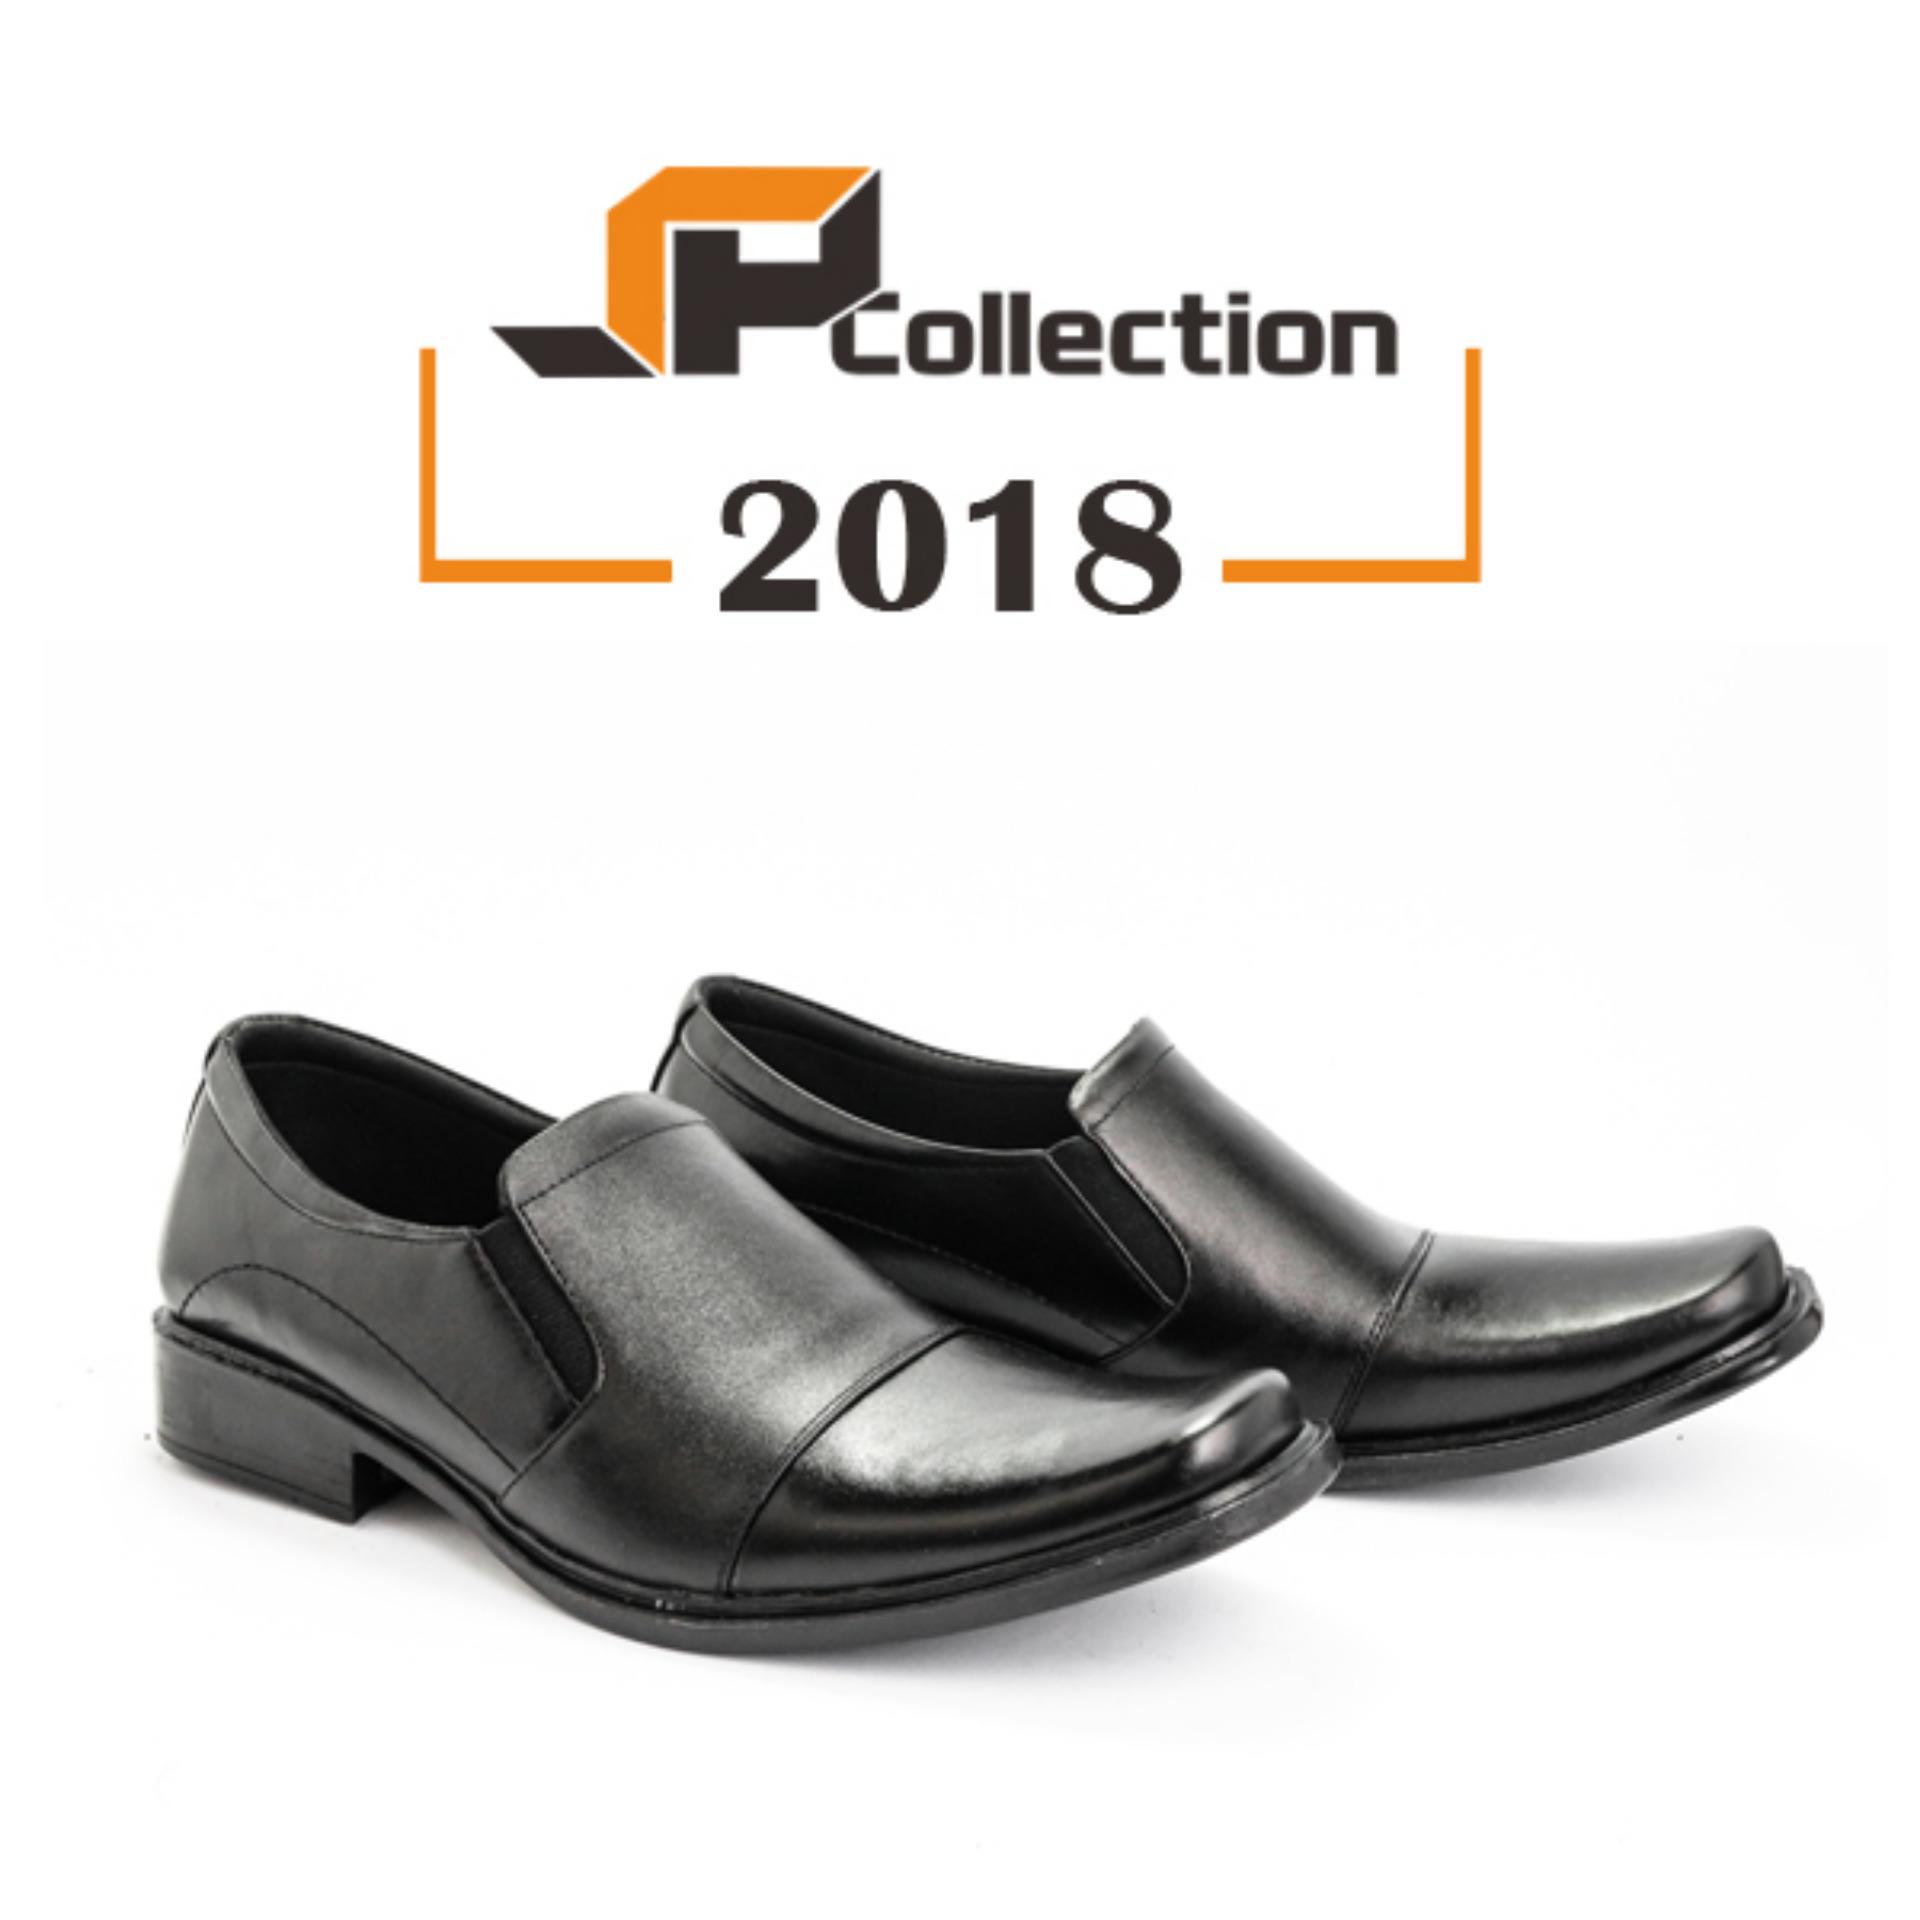 Beli Spatoo Sepatu Pantofel Pria 2018 Hitam Sepatu Kulit Sepatu Kantor Sepatu Kerja Sepatu Pdh Sepatu Kulit Murah Sepatu Kulit Pria Sepatu Pantofel Kulit Sepatu Pdh Kulit Sepatu Pria Kulit Asli Sepatu Pria Slip On Sepatu Slip On Spatoo Asli